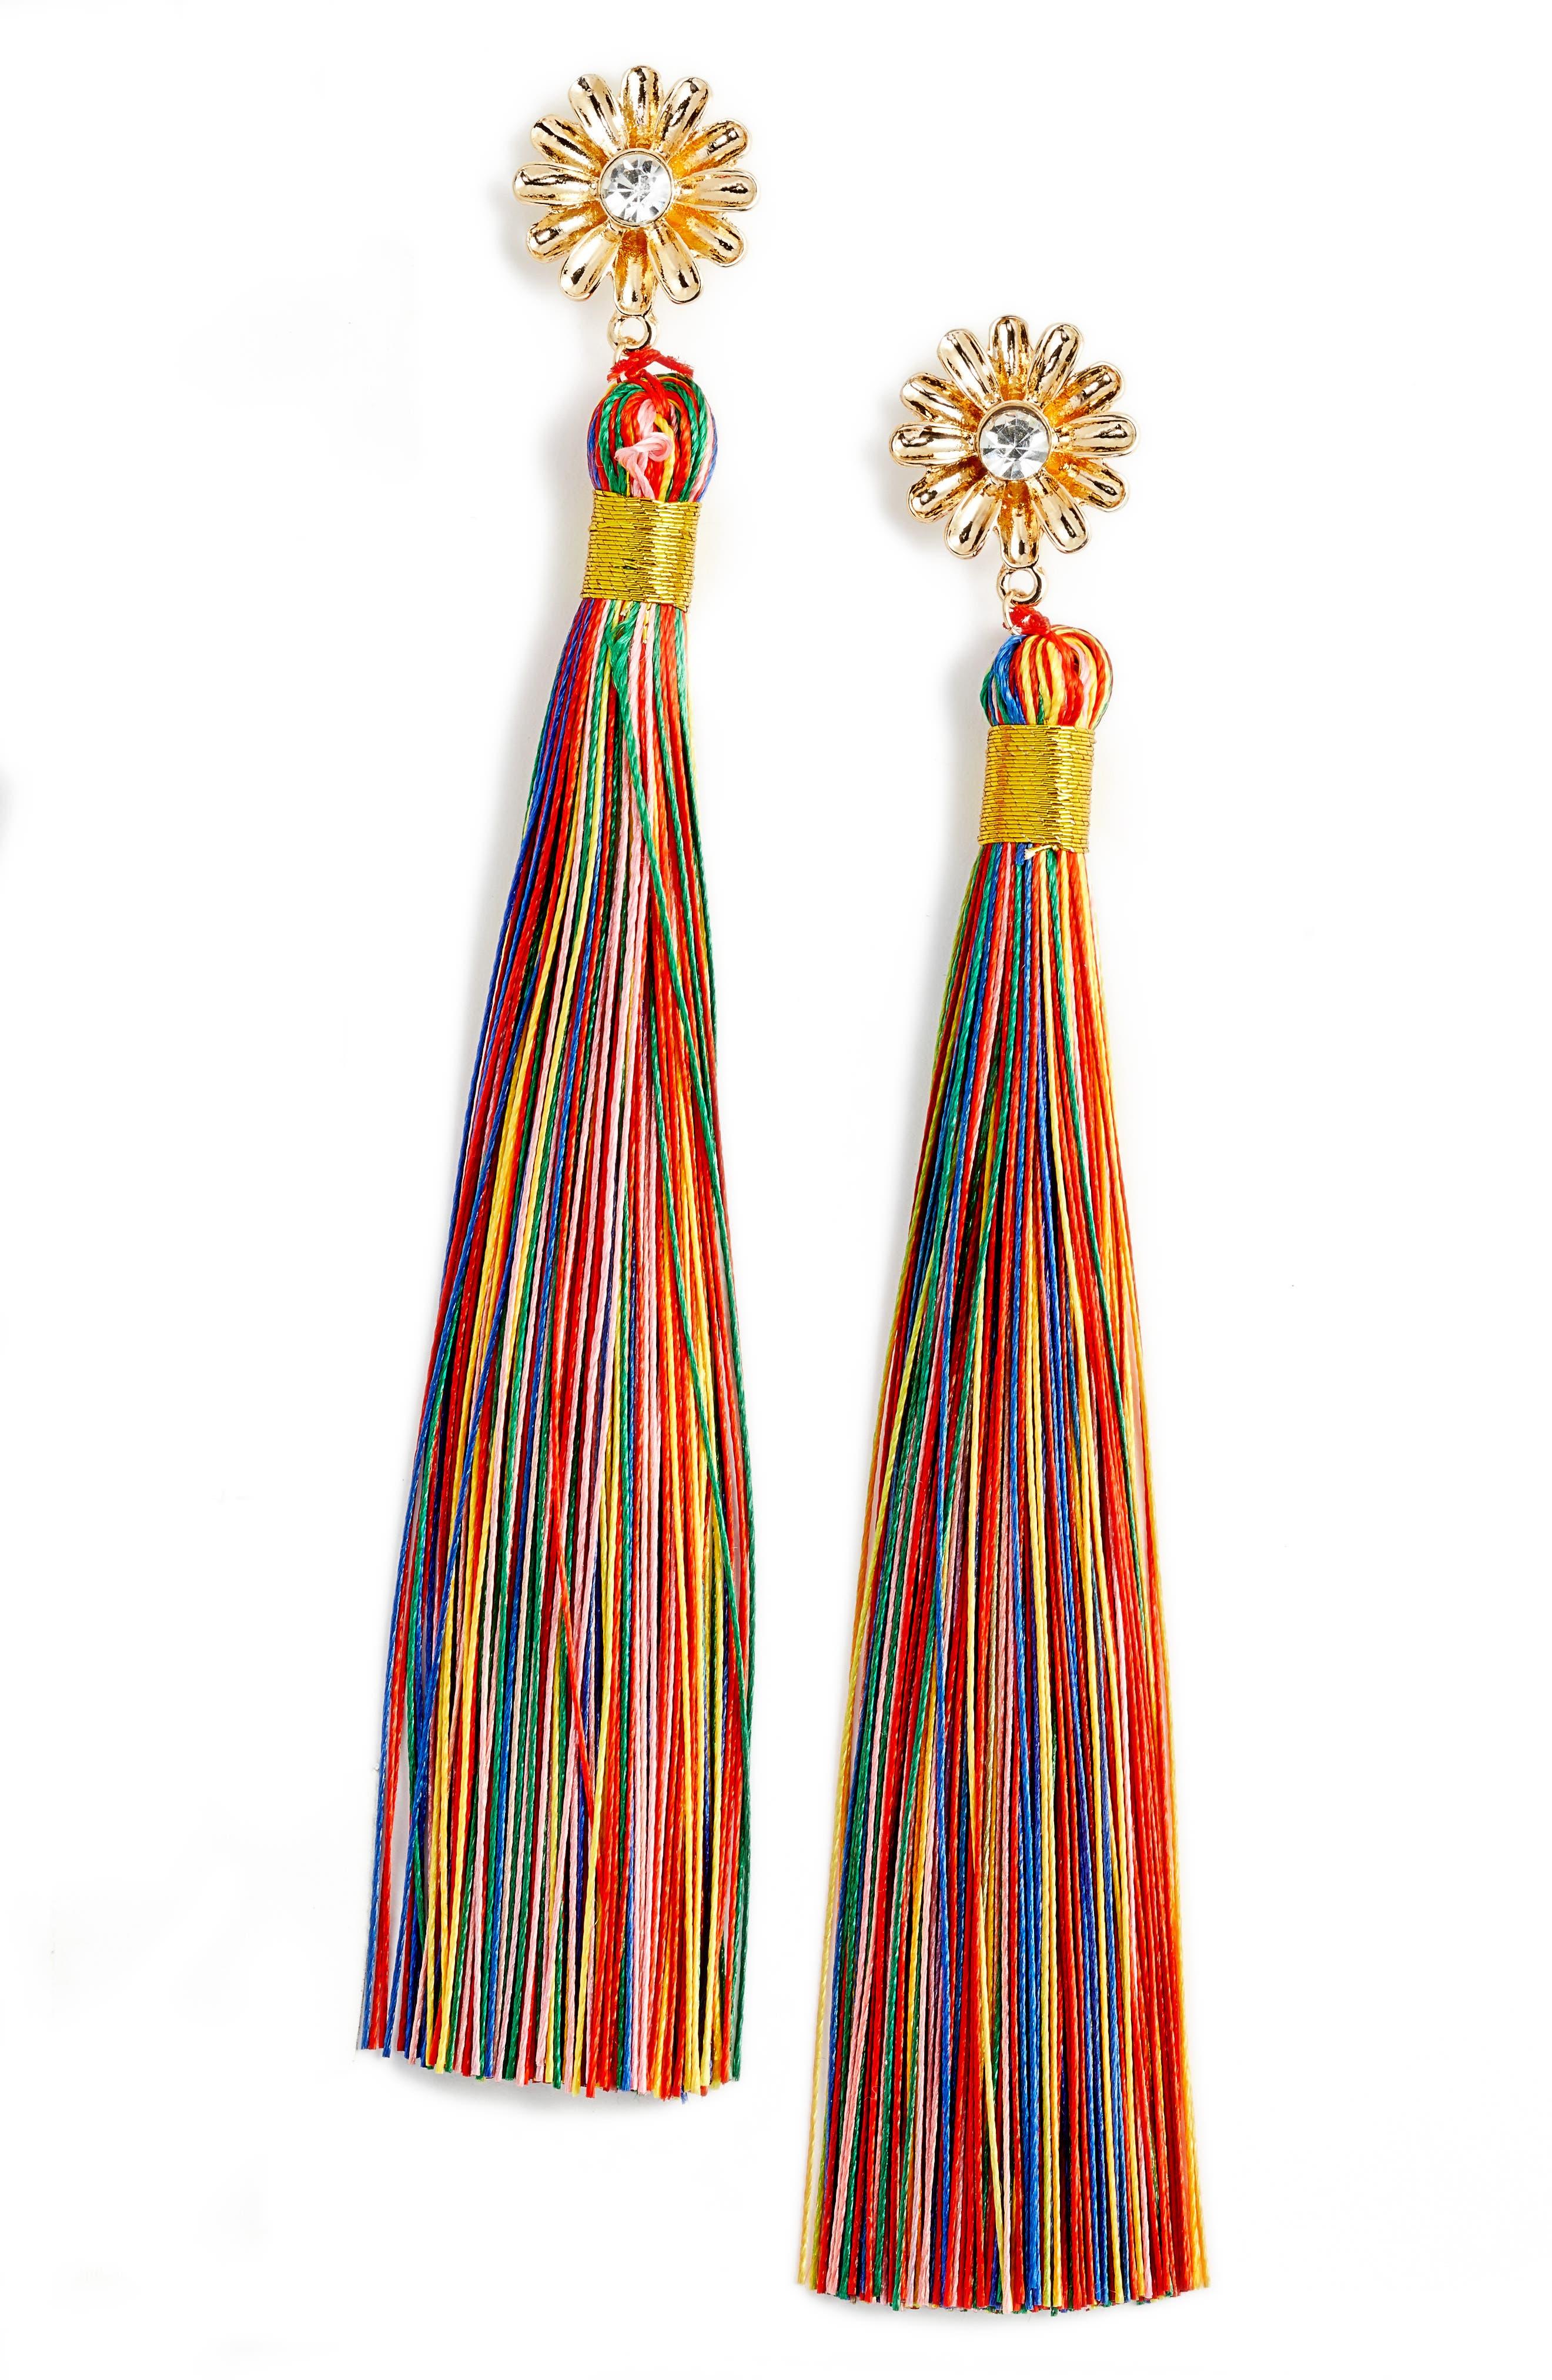 Dolce Tassel Earrings,                             Main thumbnail 1, color,                             GOLD/ MULTI